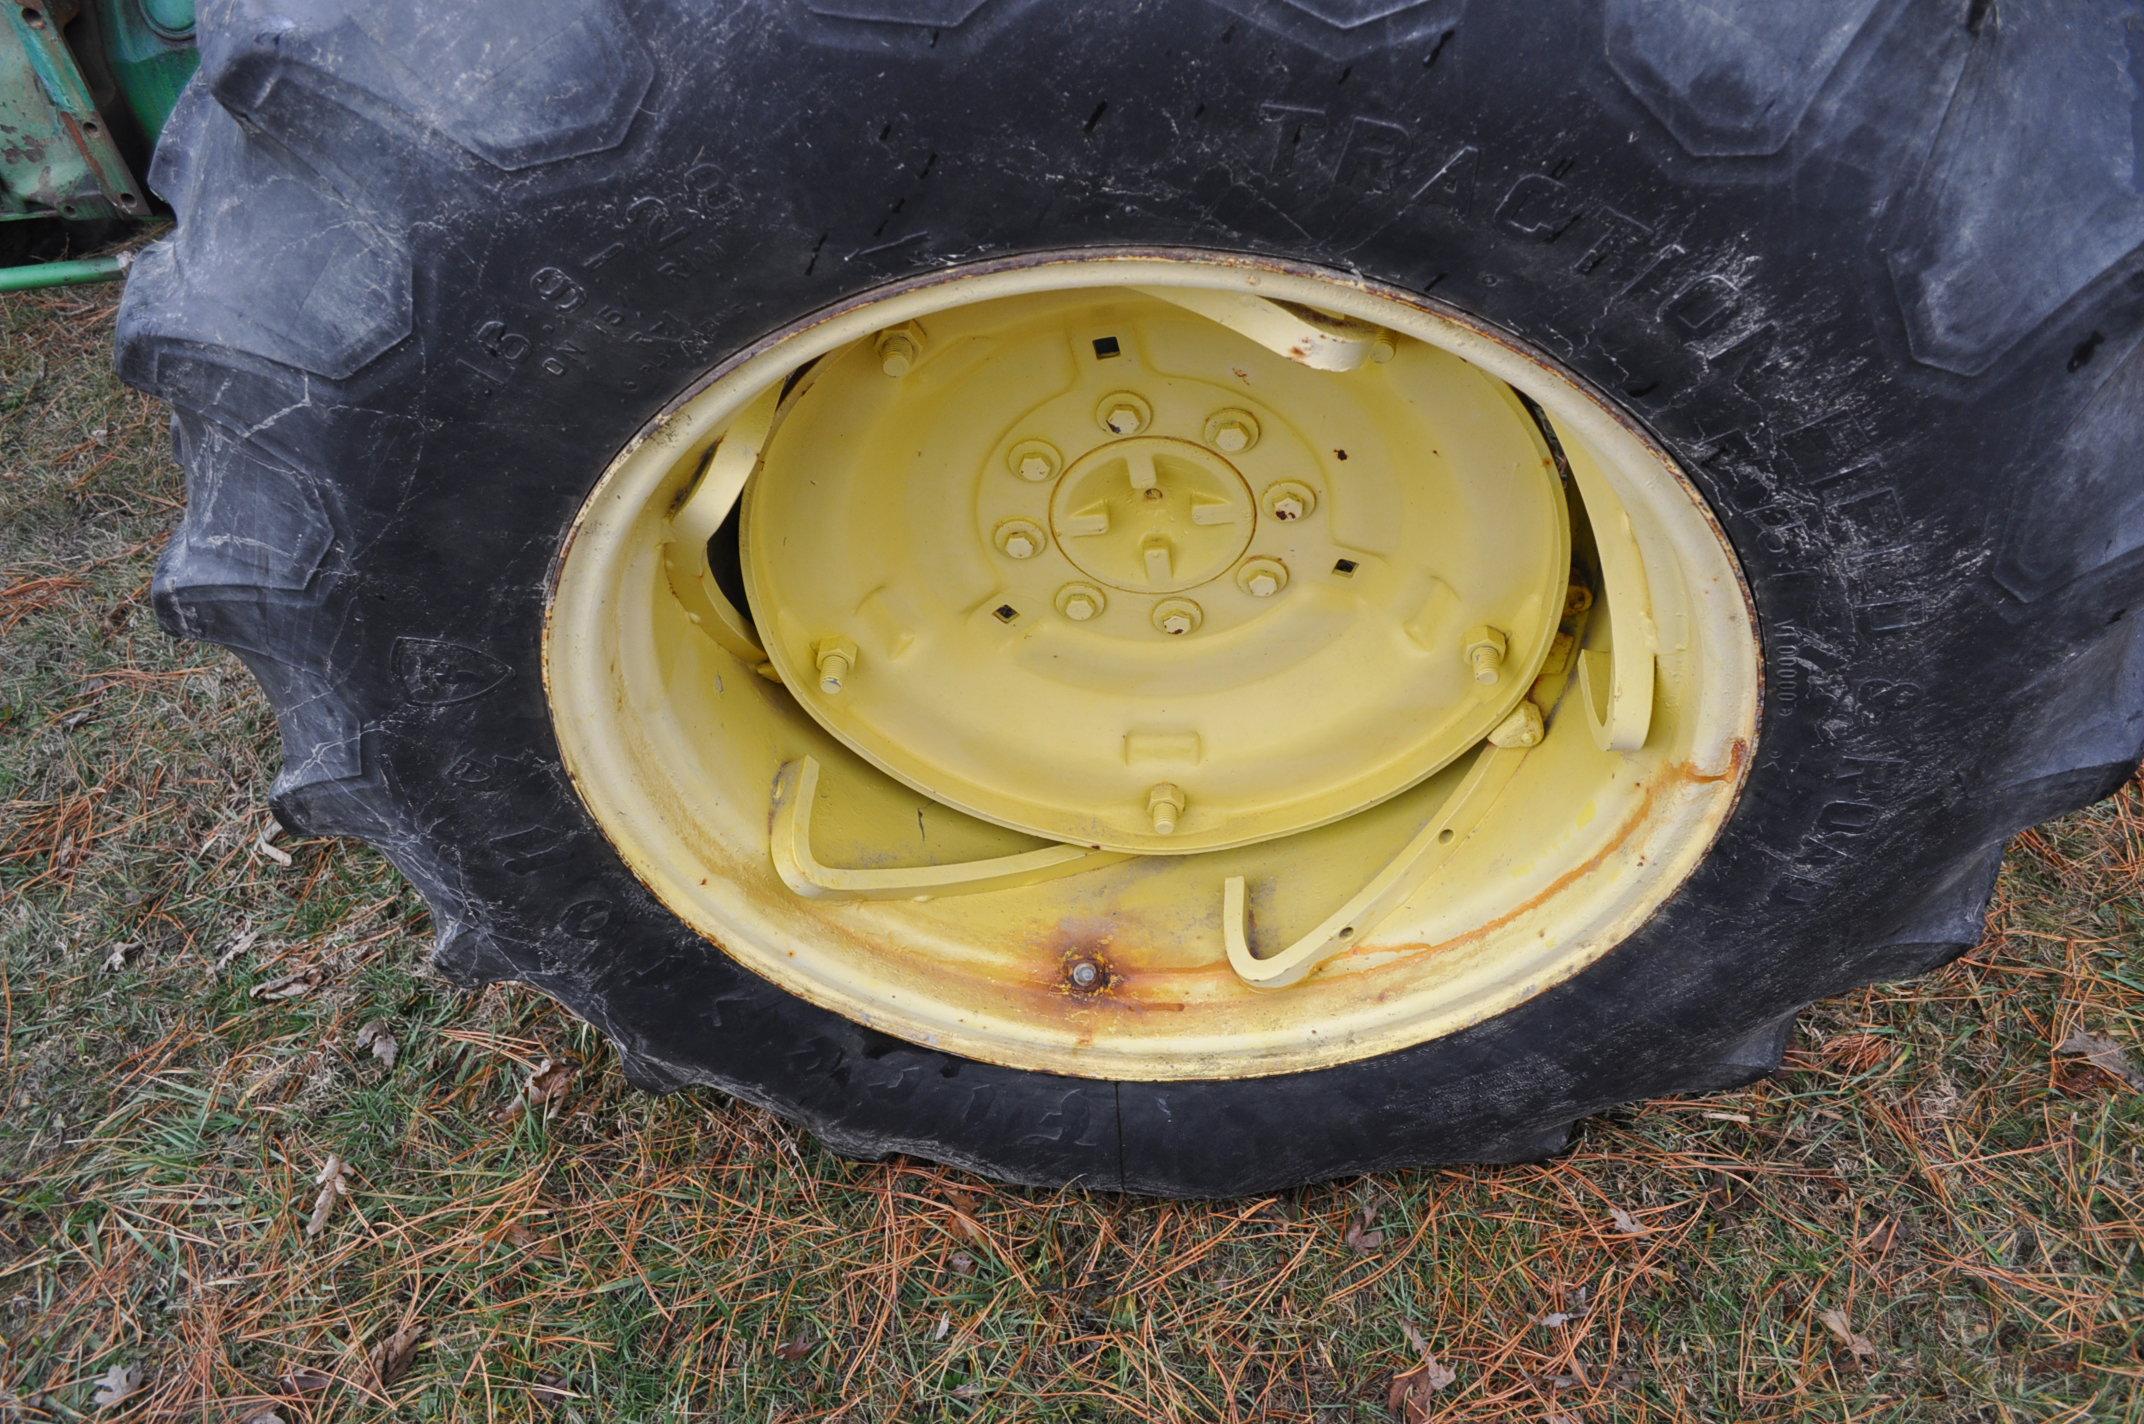 John Deere 2630 tractor, diesel, 16.9-28 rear, 9.5-15 front, 1 hyd remote, 540 pto, 3 pt, 4260 - Image 12 of 18